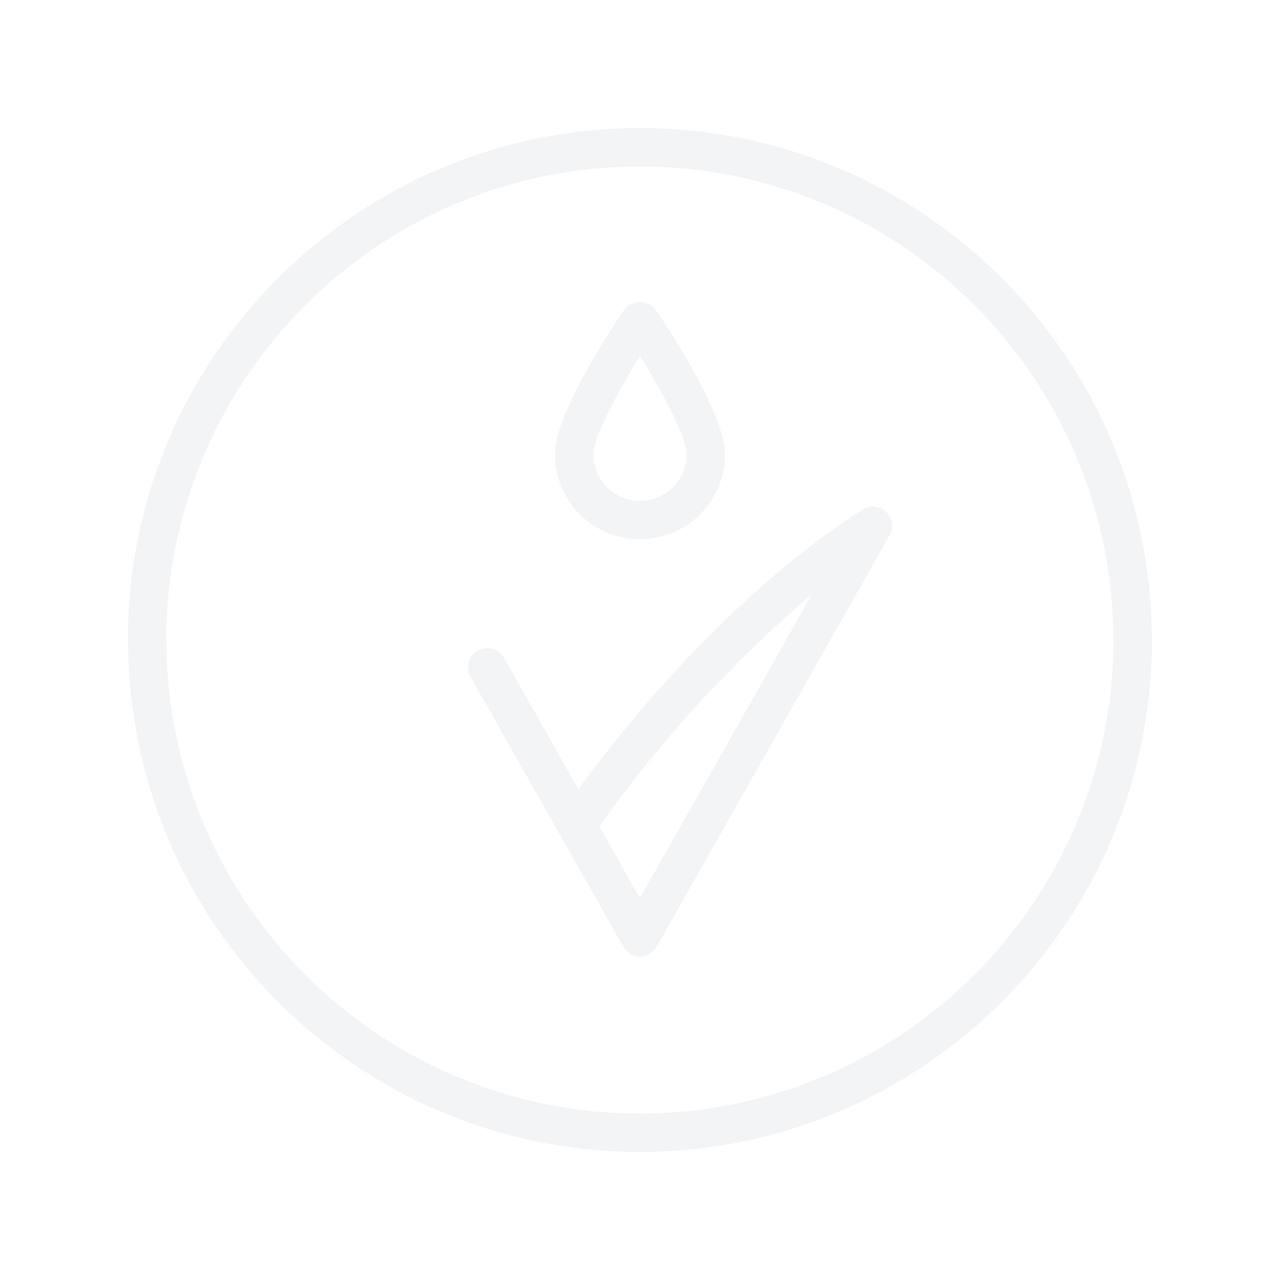 DOLCE & GABBANA Light Blue 50ml Eau De Toilette Gift Set